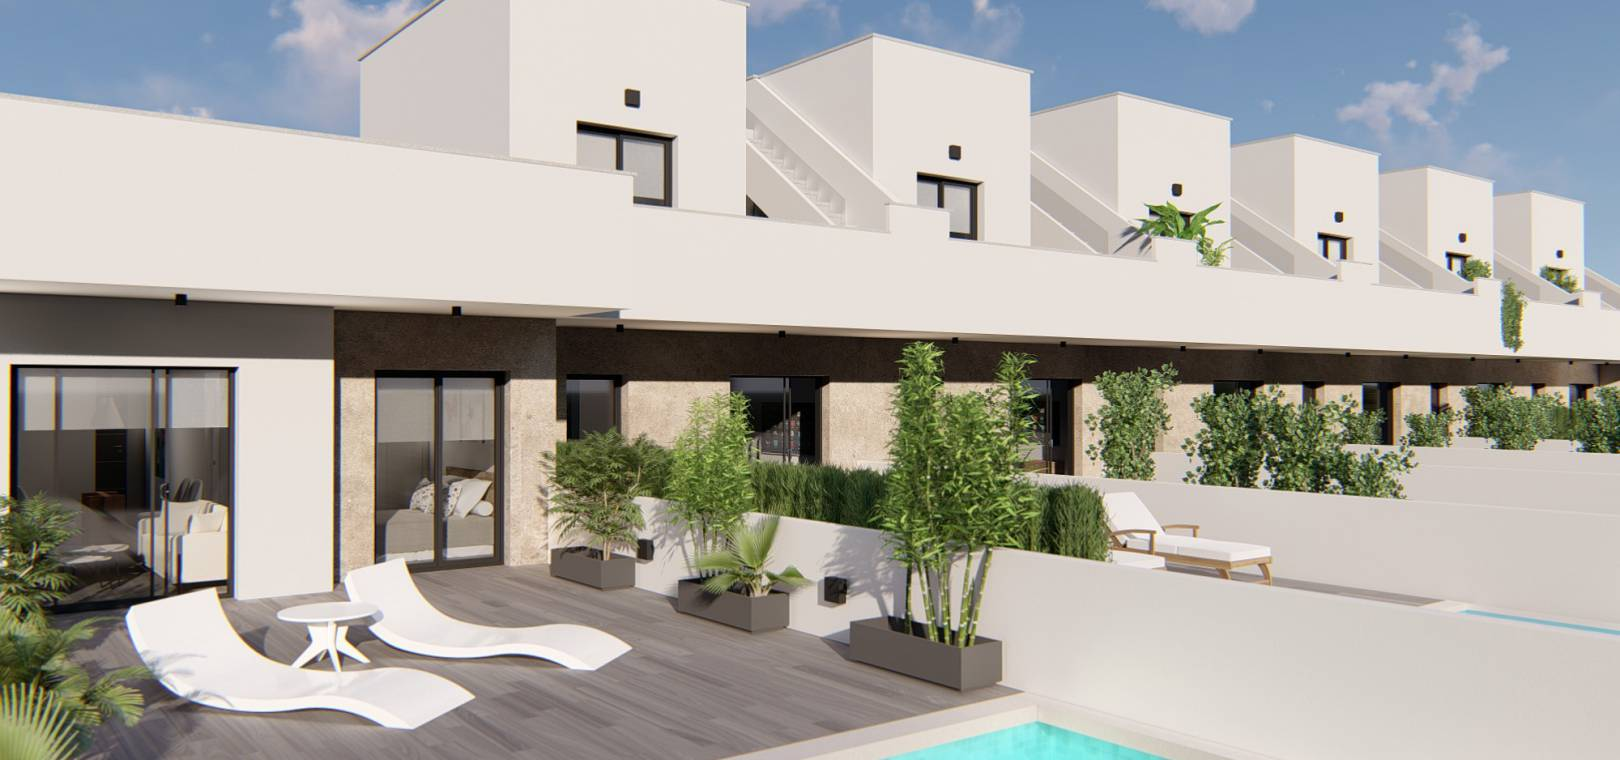 Pilar_de_la_Horadada_New_Build_Properties_For_Sale_nsp259_1